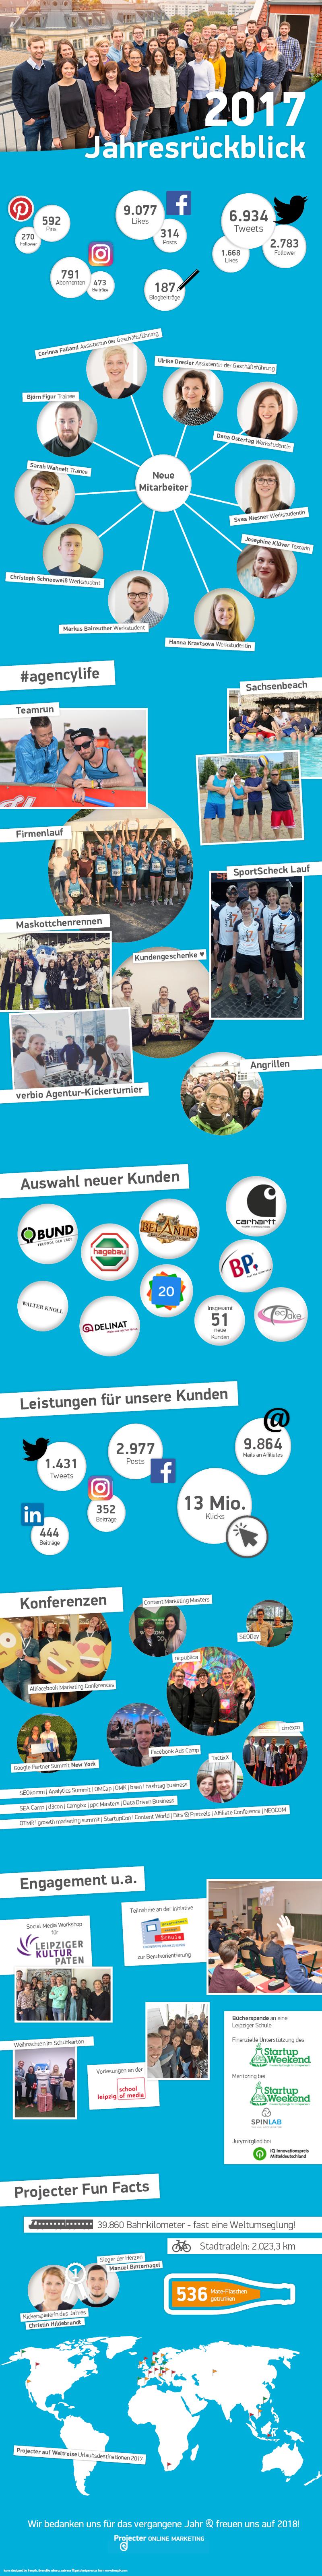 Jahresrückblick_Projecter_2017